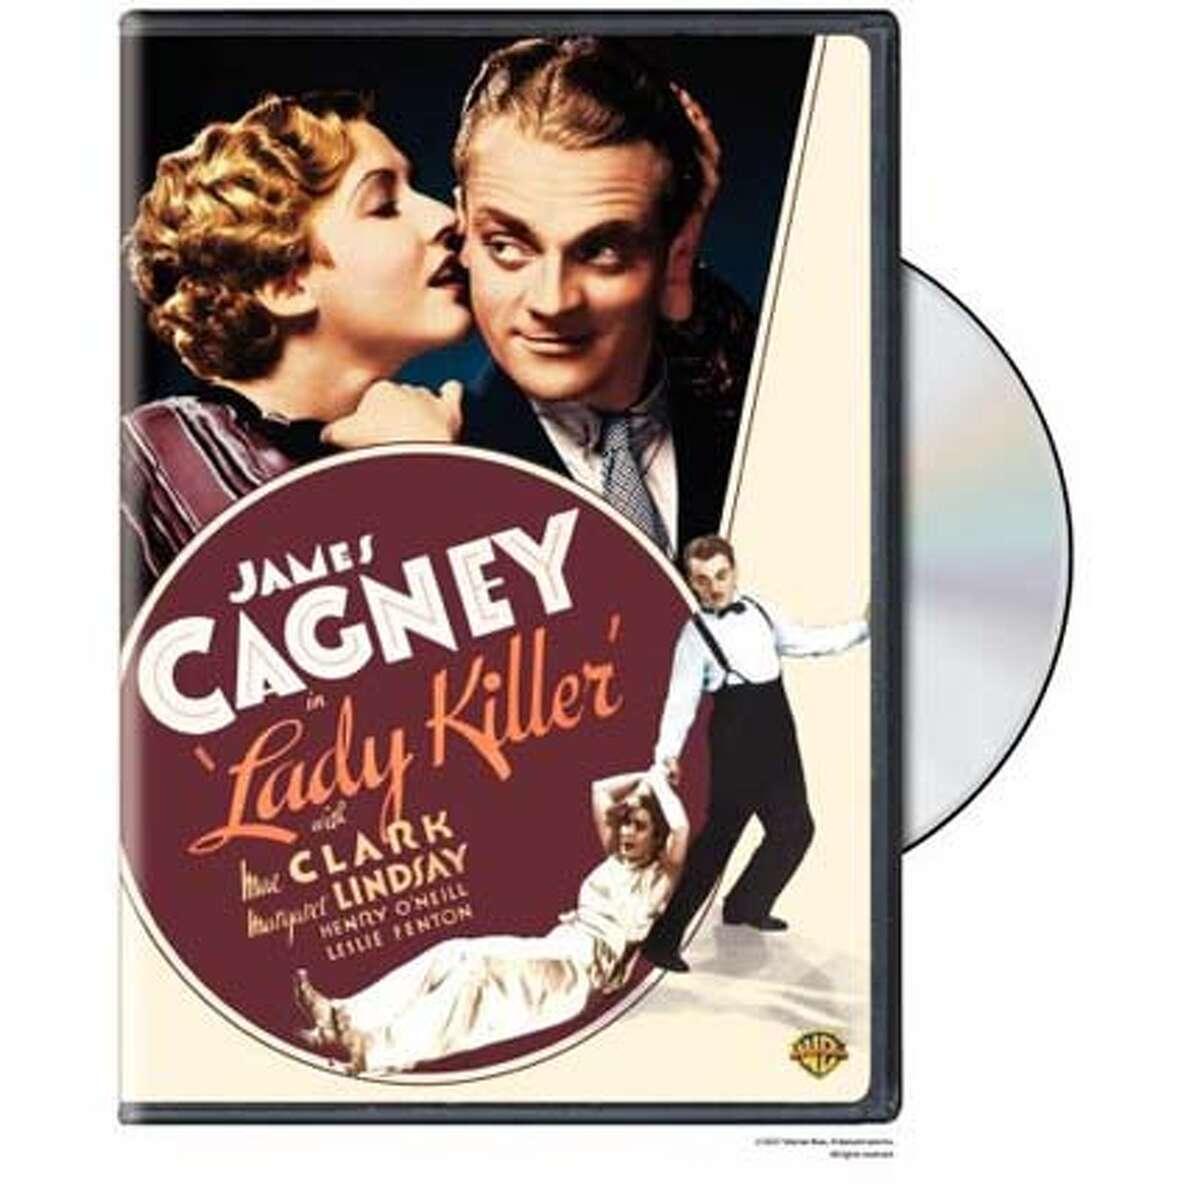 ###Live Caption:dvd cover LADY KILLER###Caption History:dvd cover LADY KILLER###Notes:###Special Instructions: